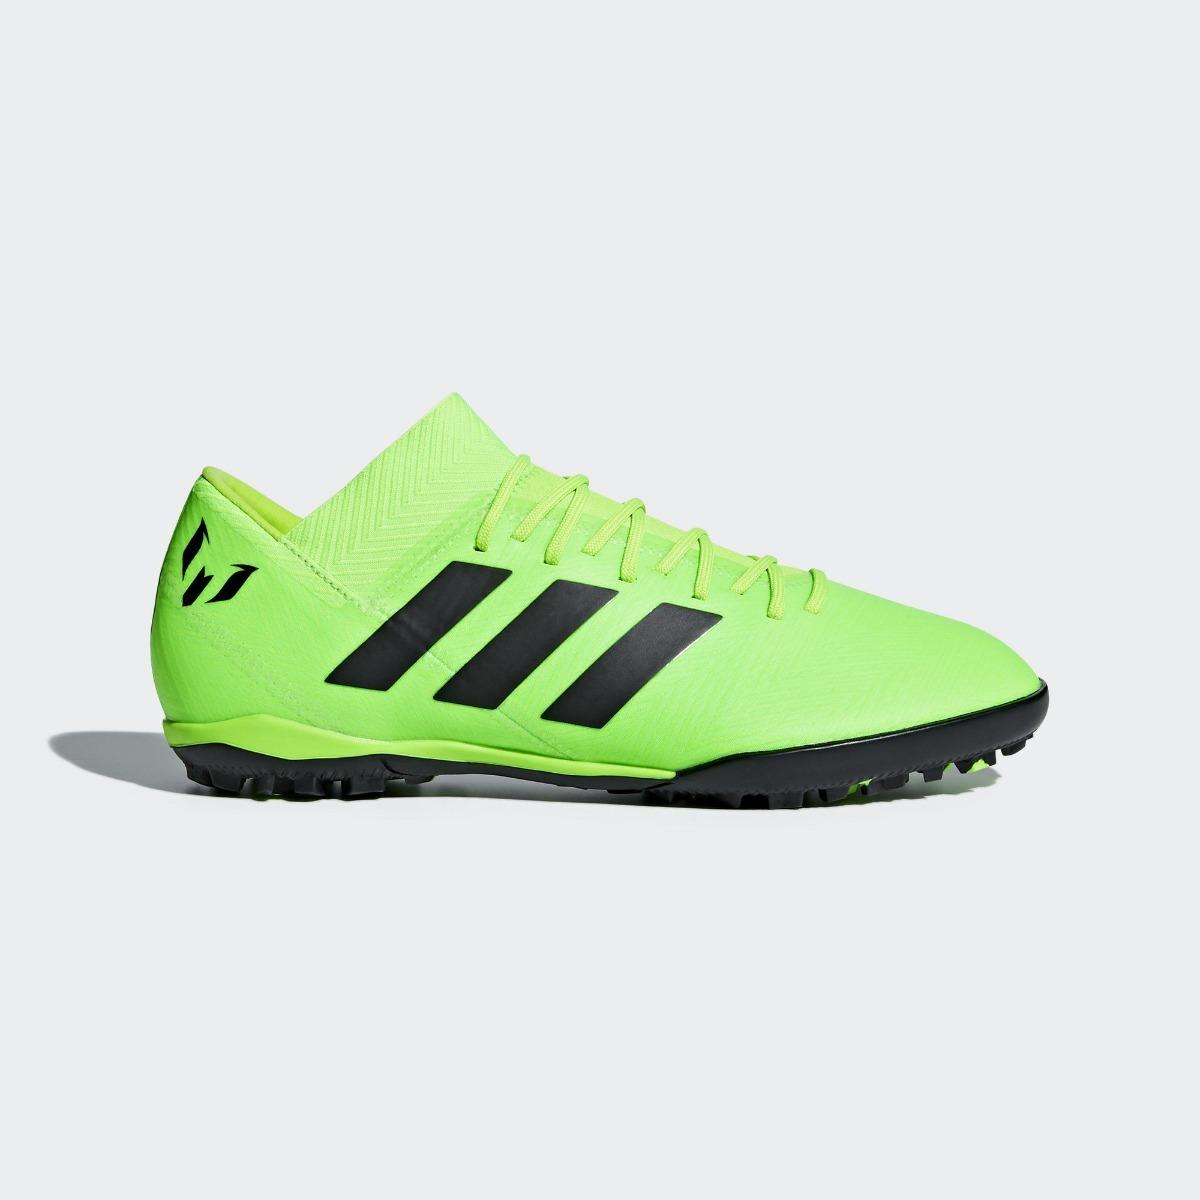 c917511bff602 Taquetes adidas Nemeziz Messi Tango 18.3 Futbol Soccer -   1